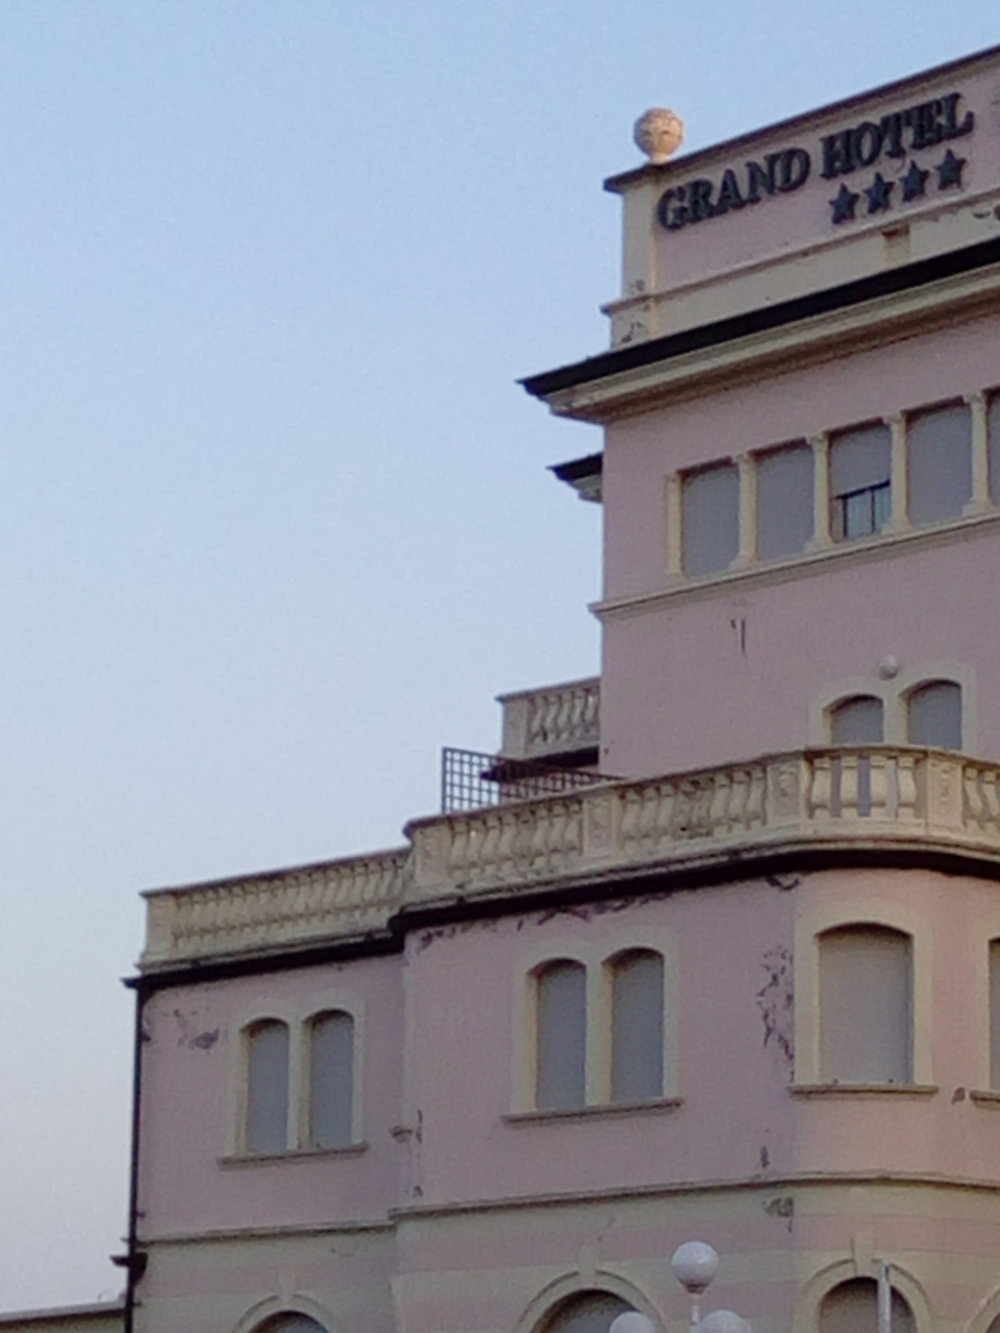 grand hotel 2.jpg